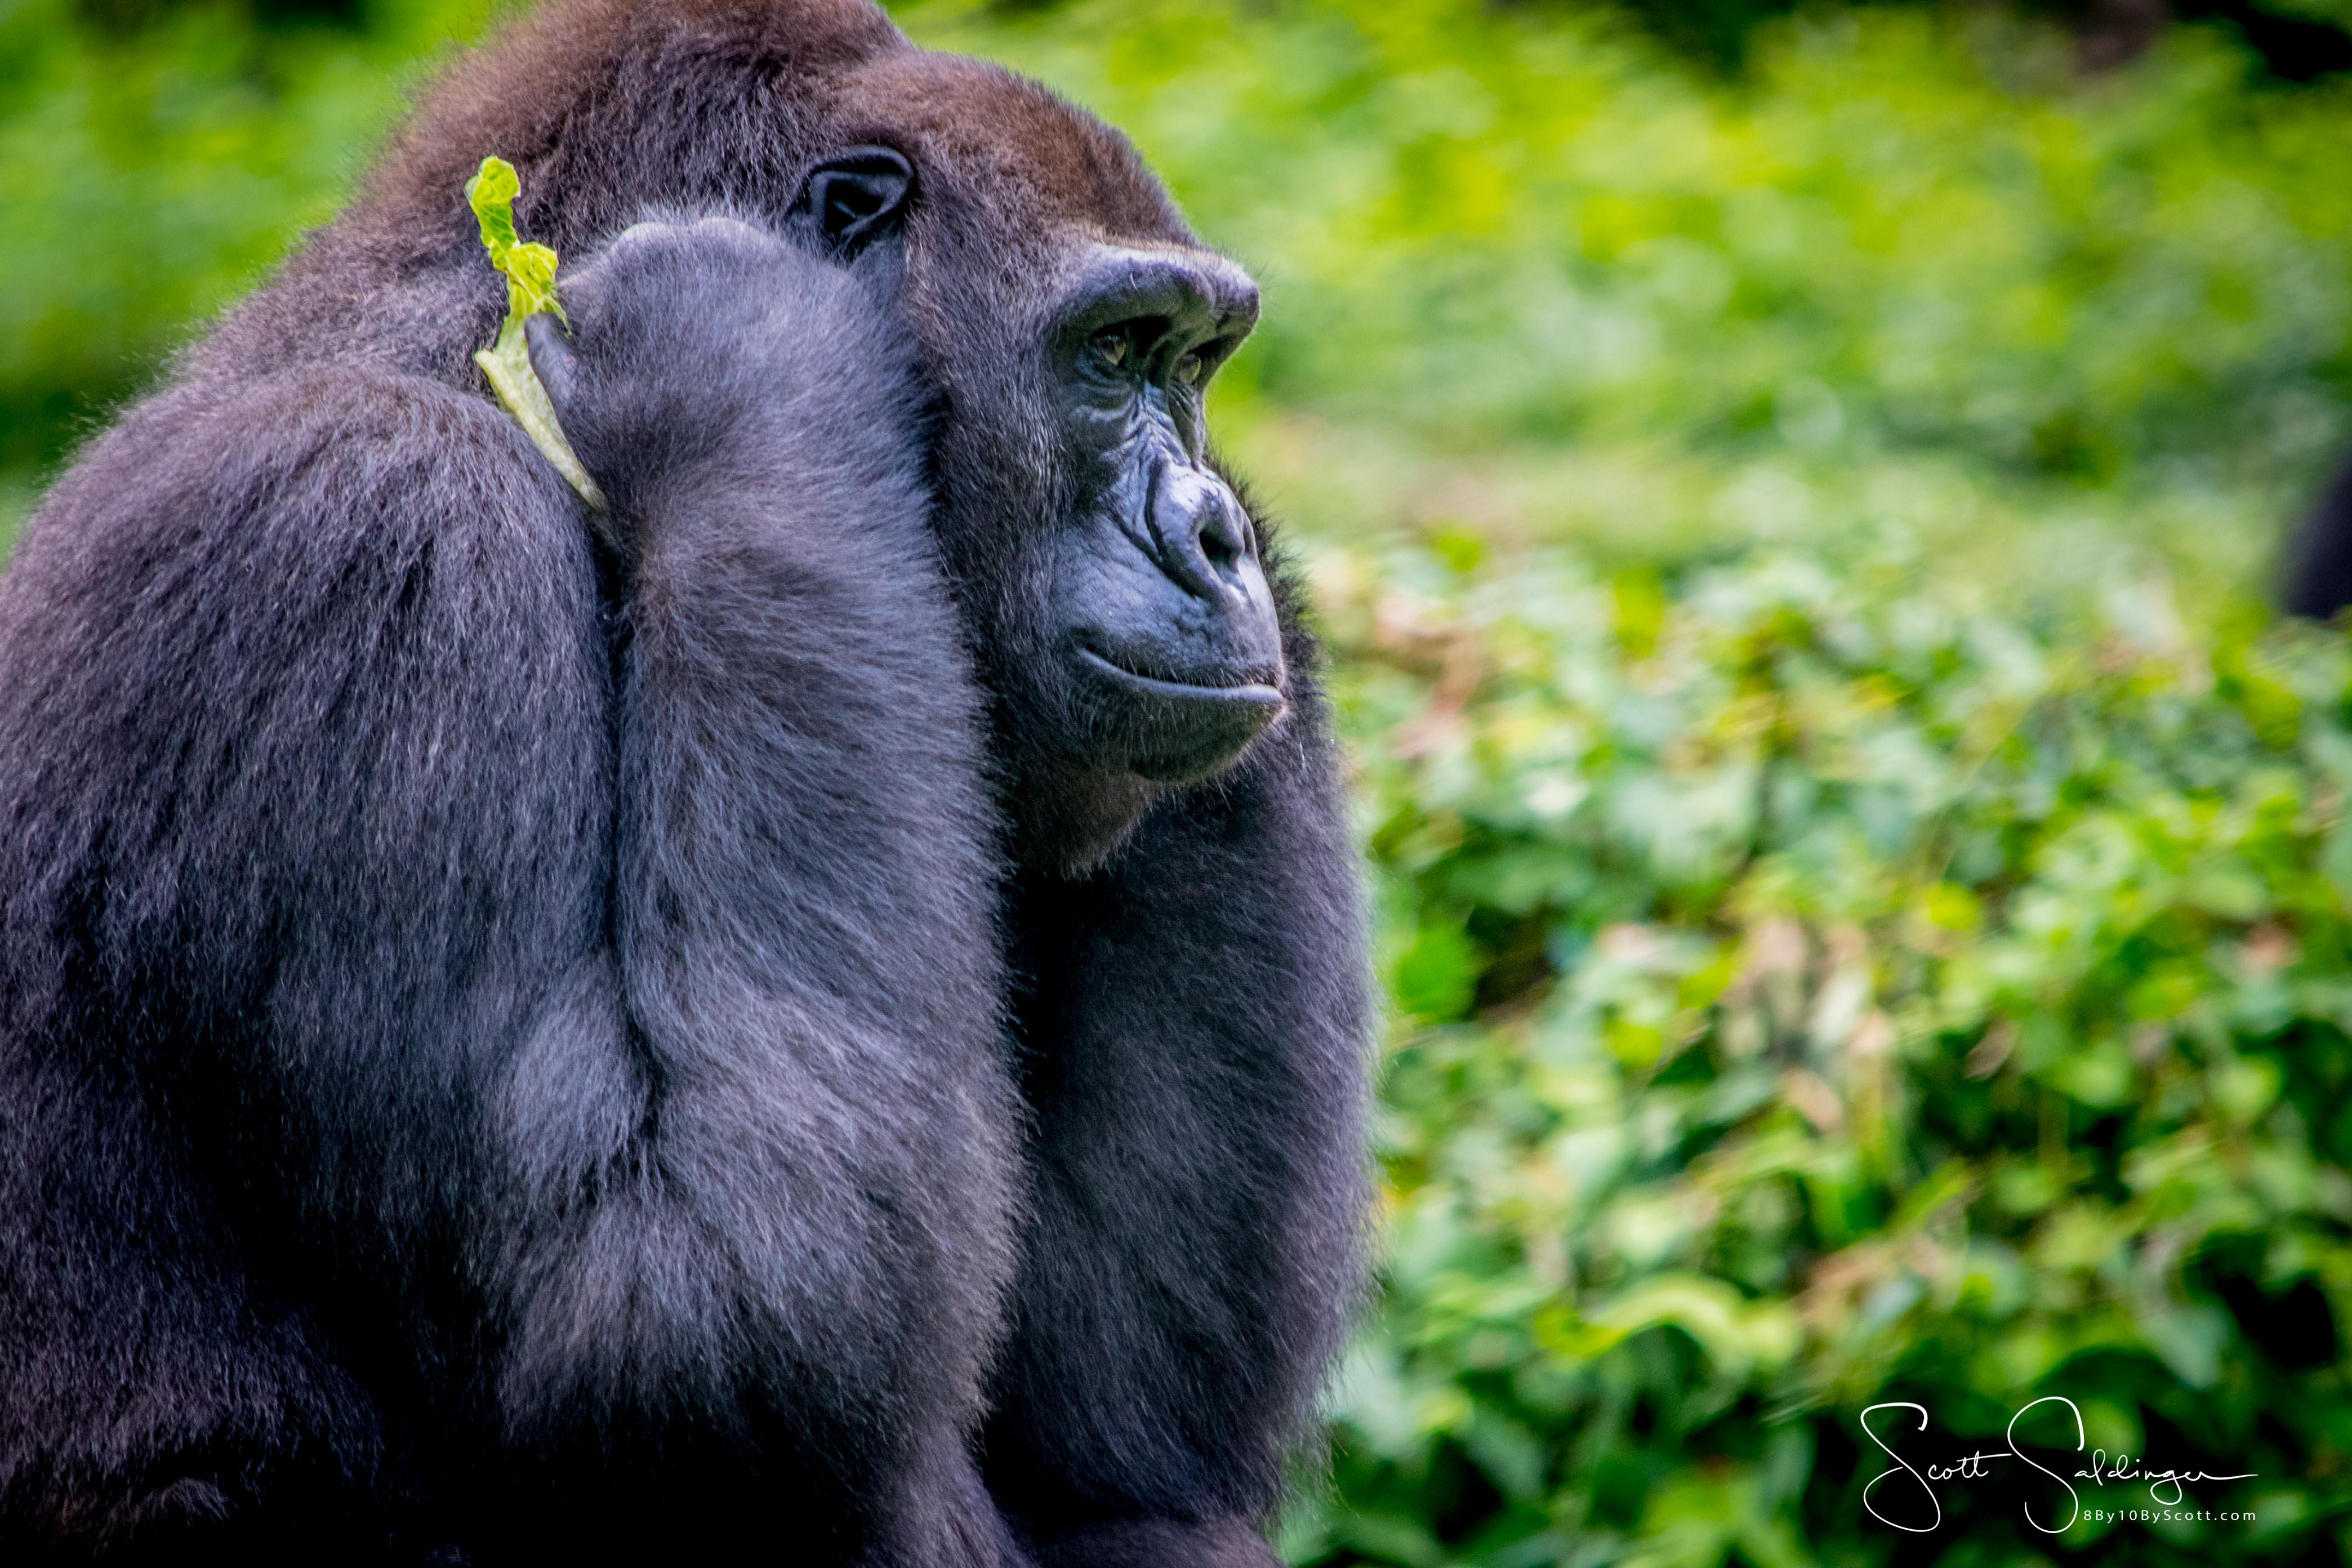 Apes-5299